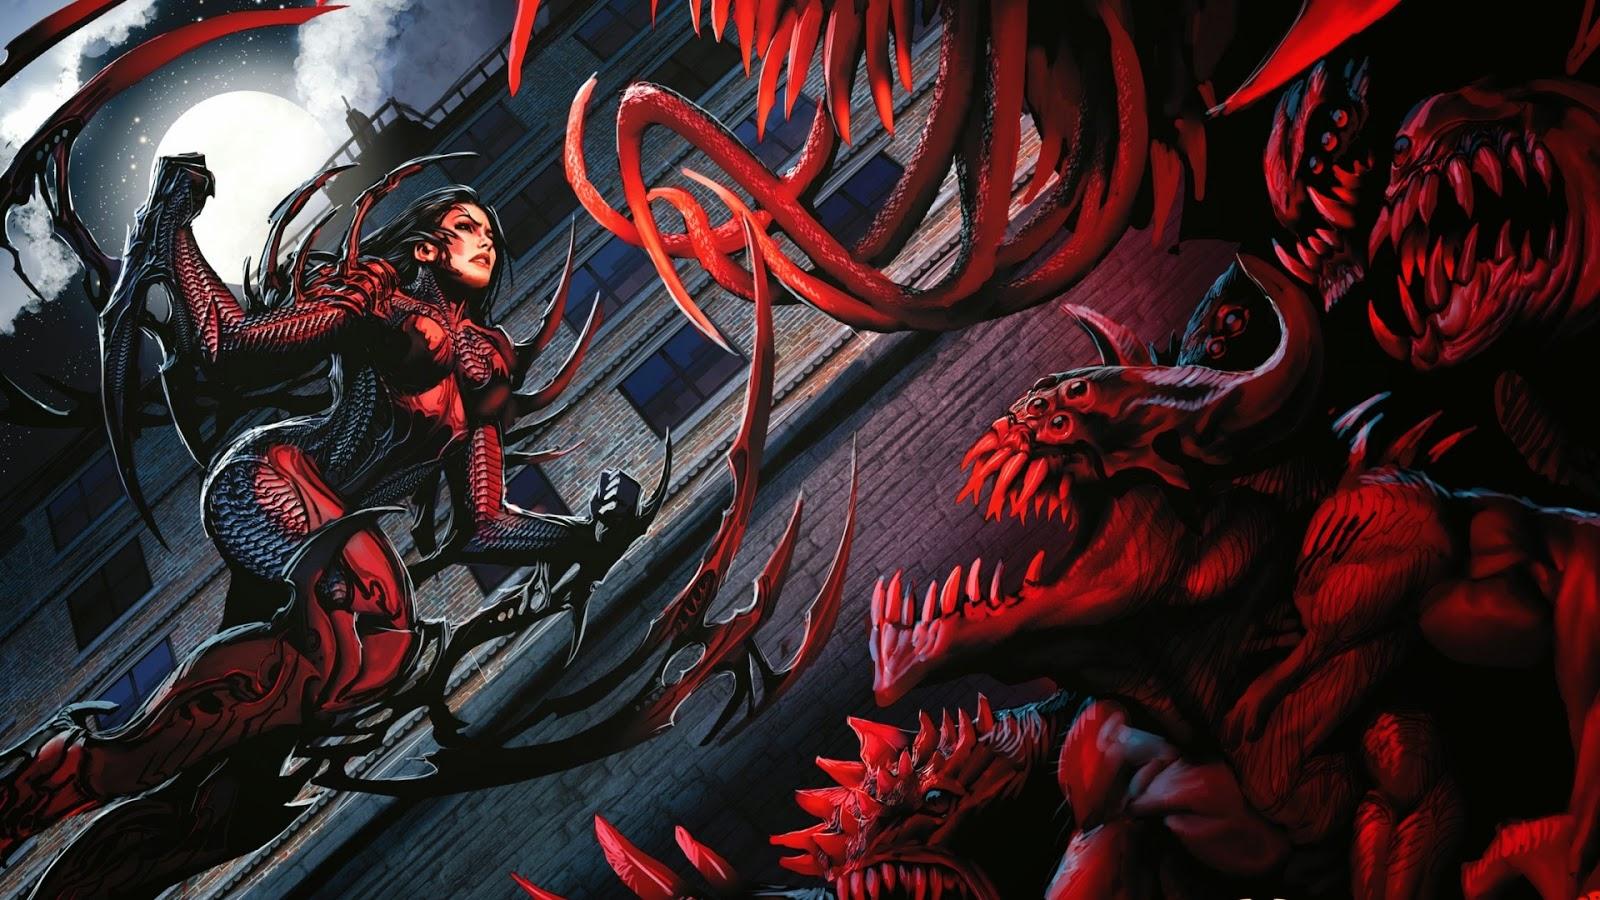 Red Nova Dragon Wallpaper Hair Styles